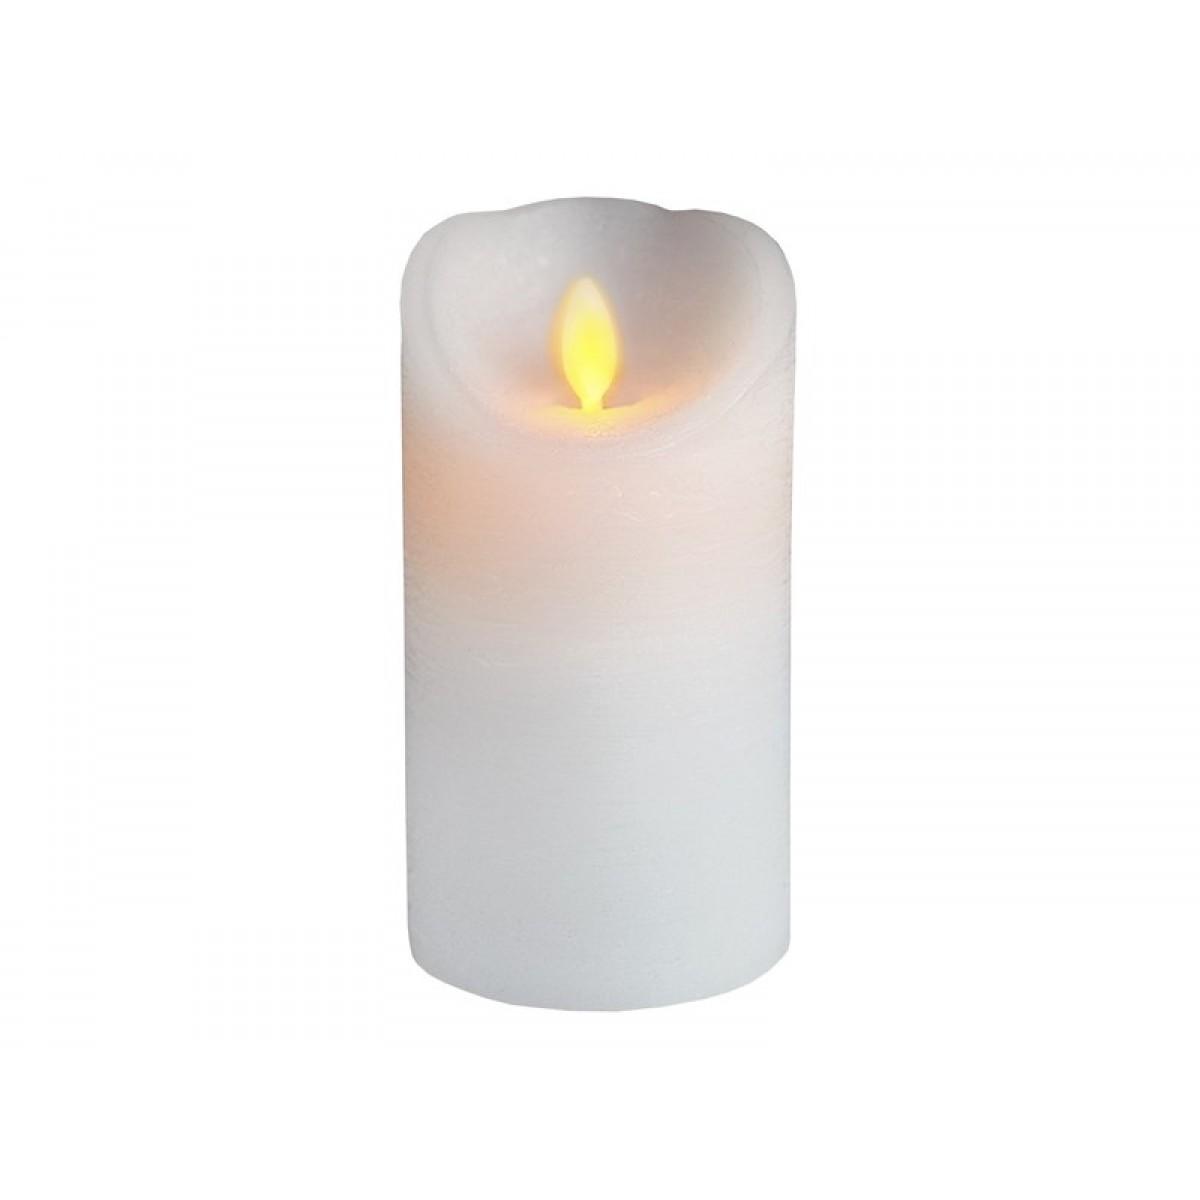 Bloklys Hvid - Bevægelig Flamme 7,5 x 12,5 cm.